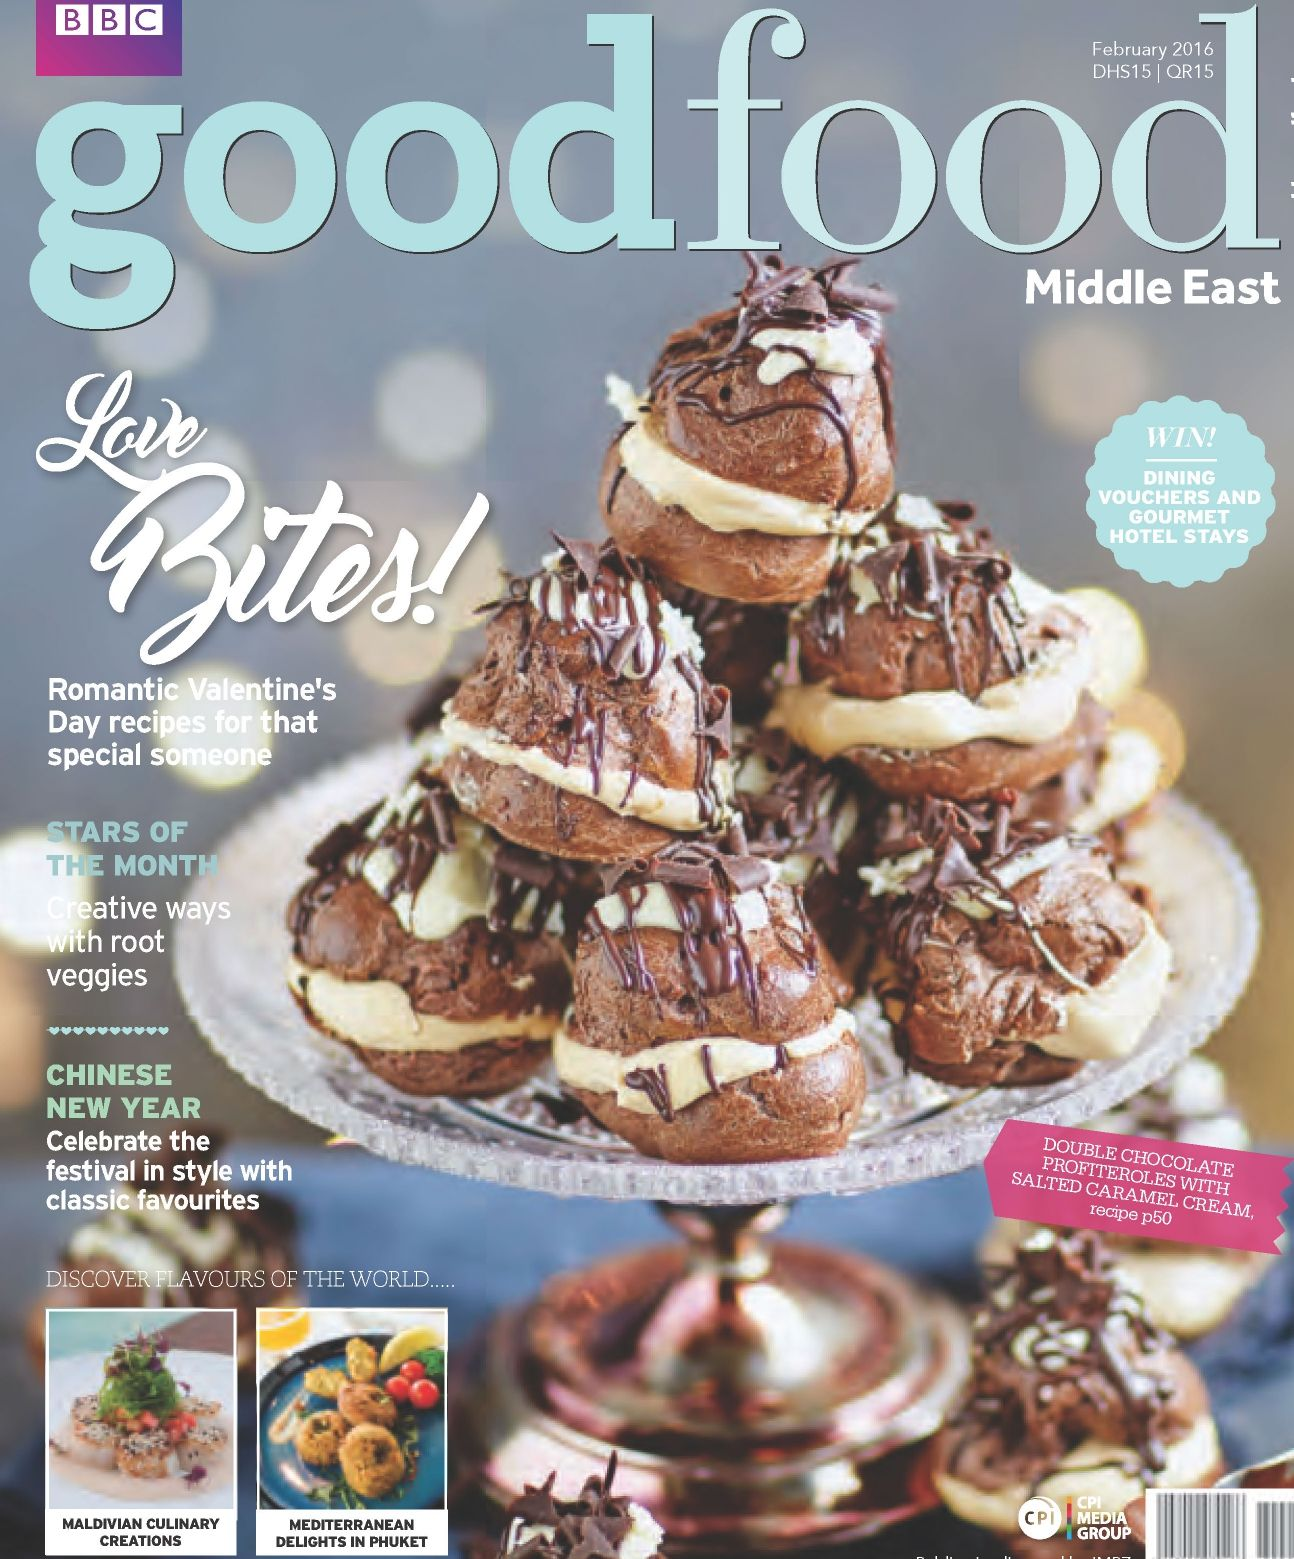 BBC Good Food Middle East 02 February 2016 | Bbc good food ...